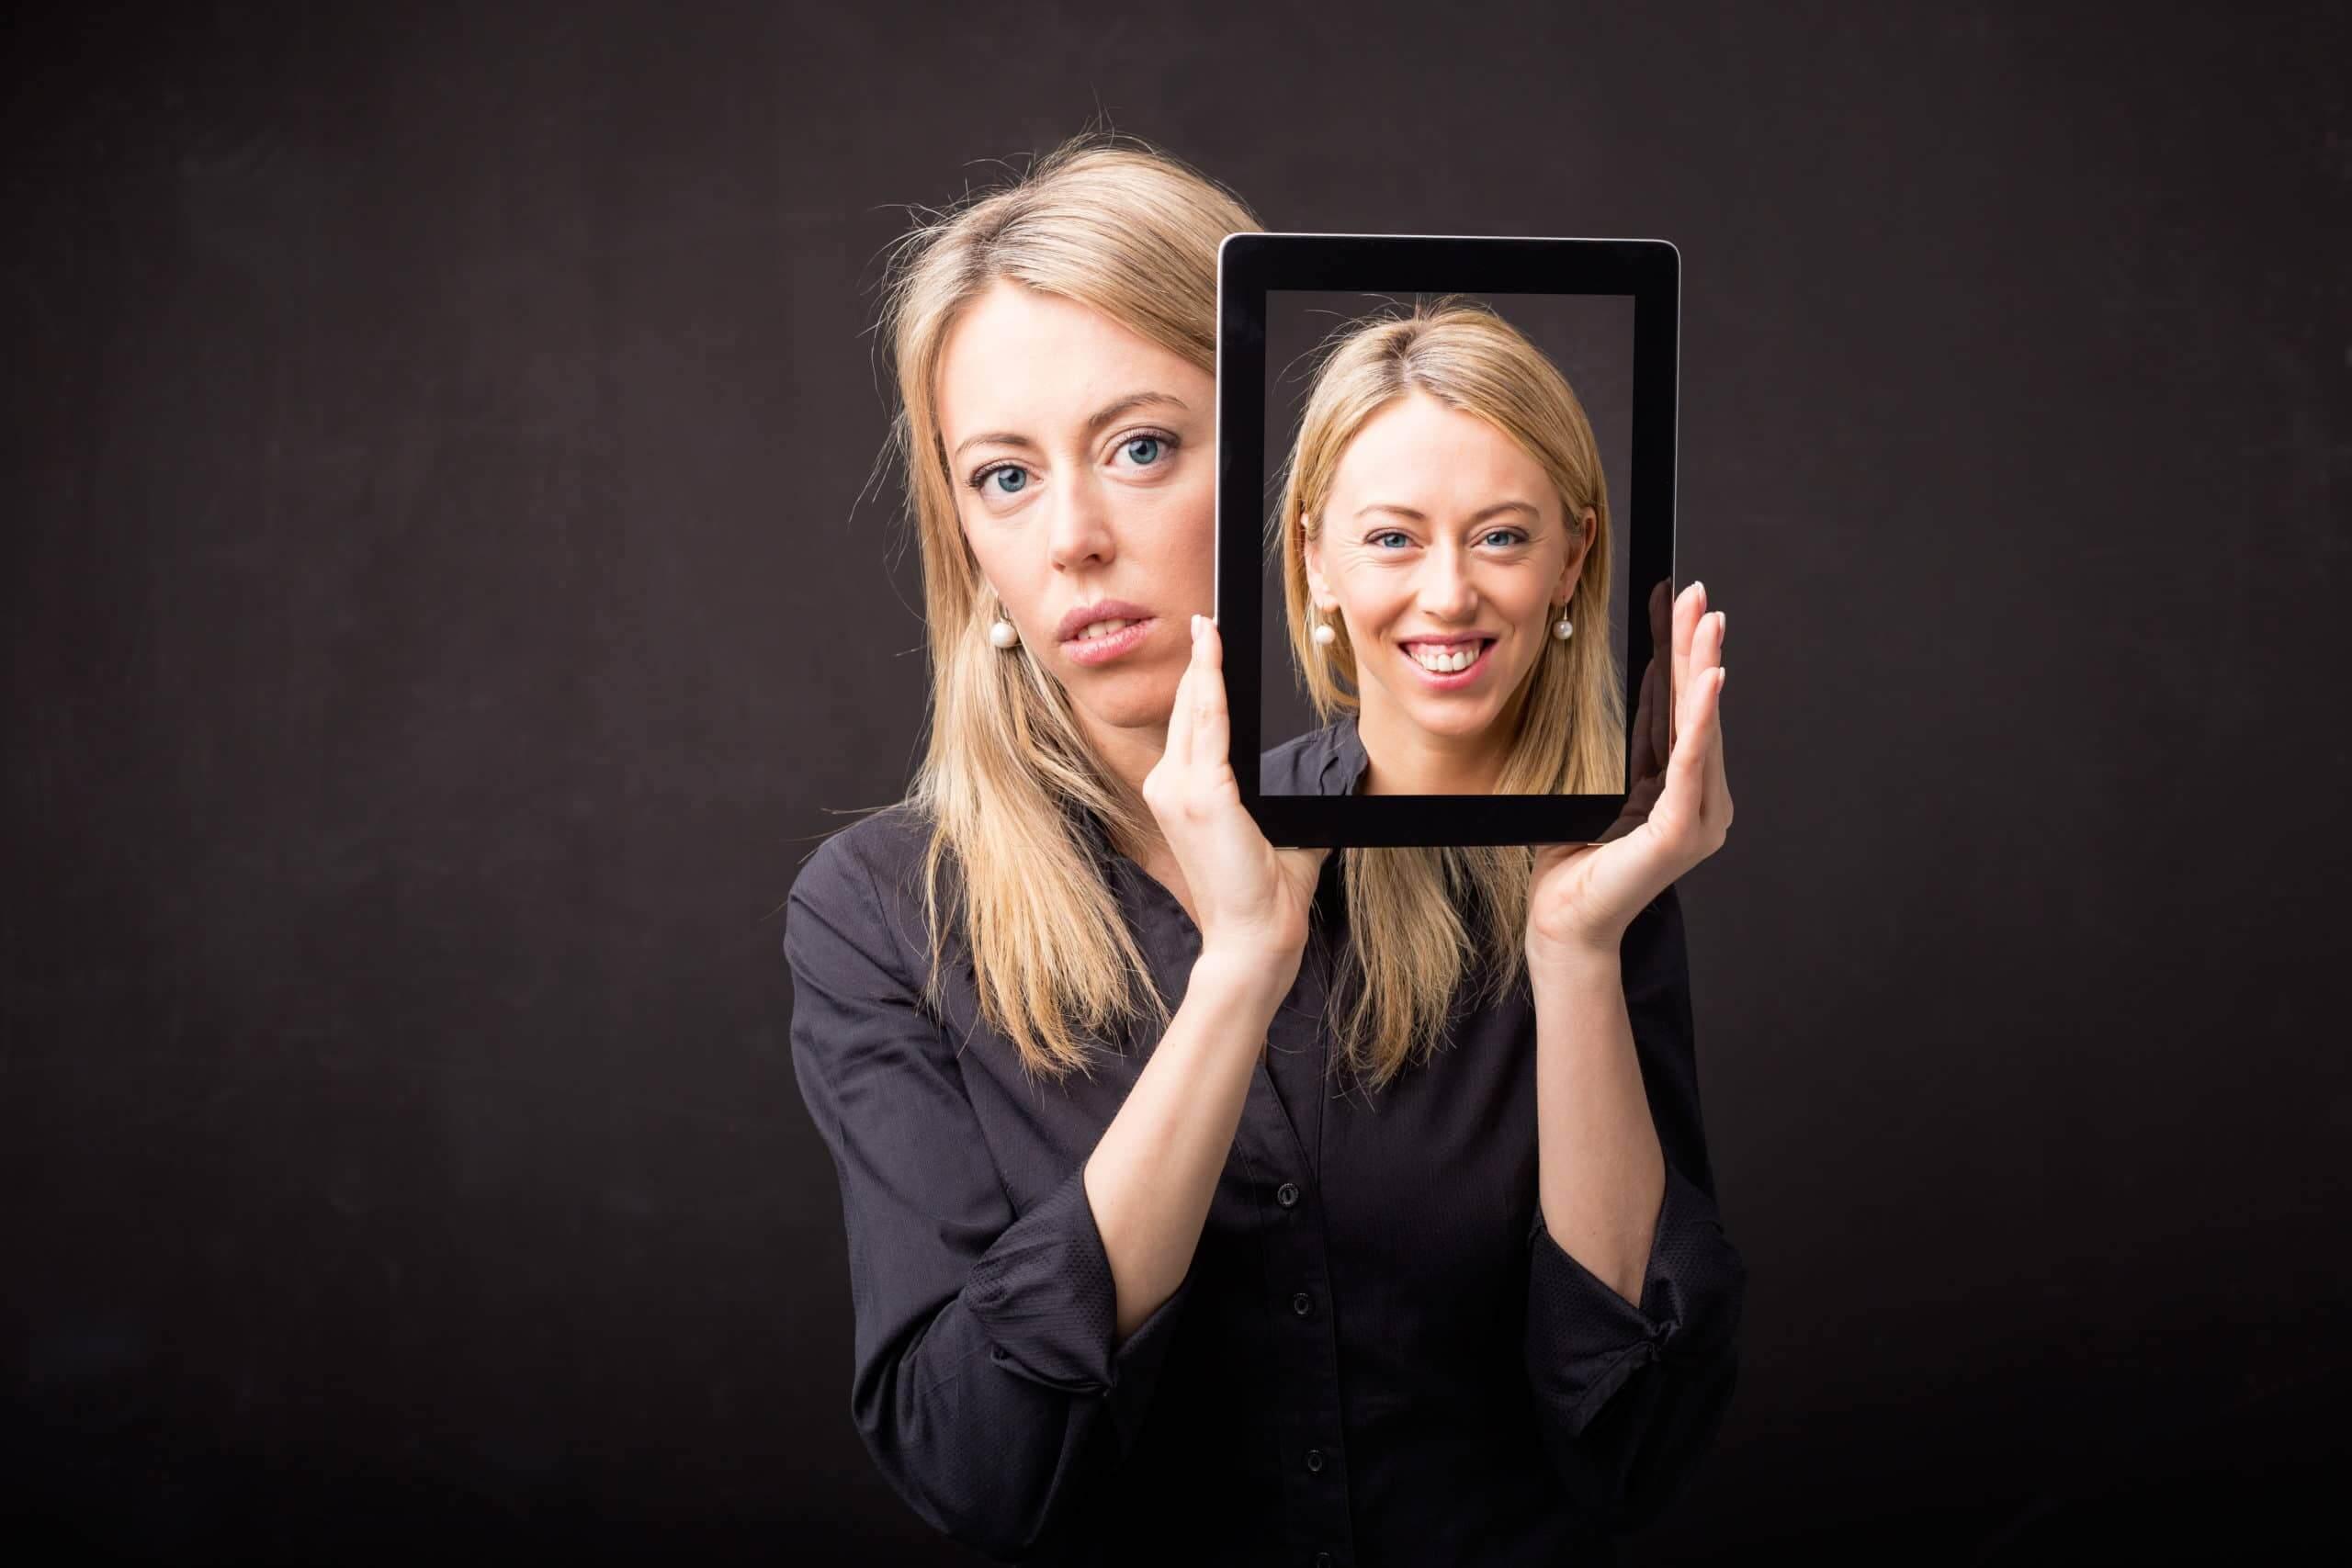 Woman showing happy portrait on tablet